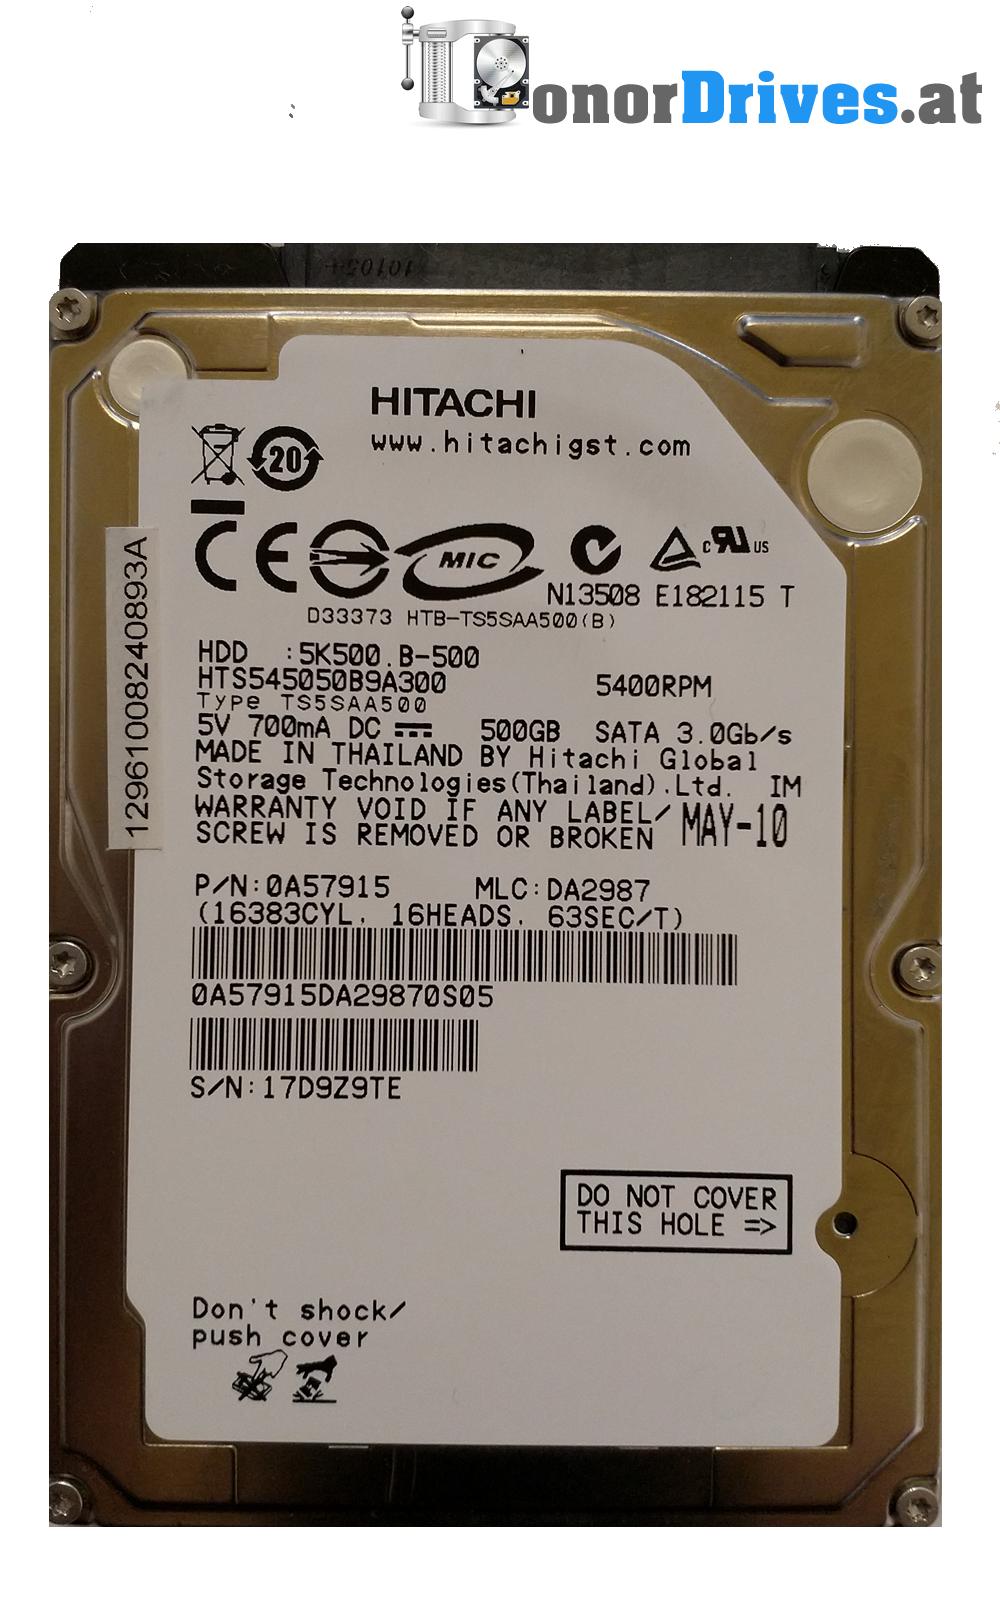 HITACHI HDD 5K500 B-500 DRIVERS FOR WINDOWS 7